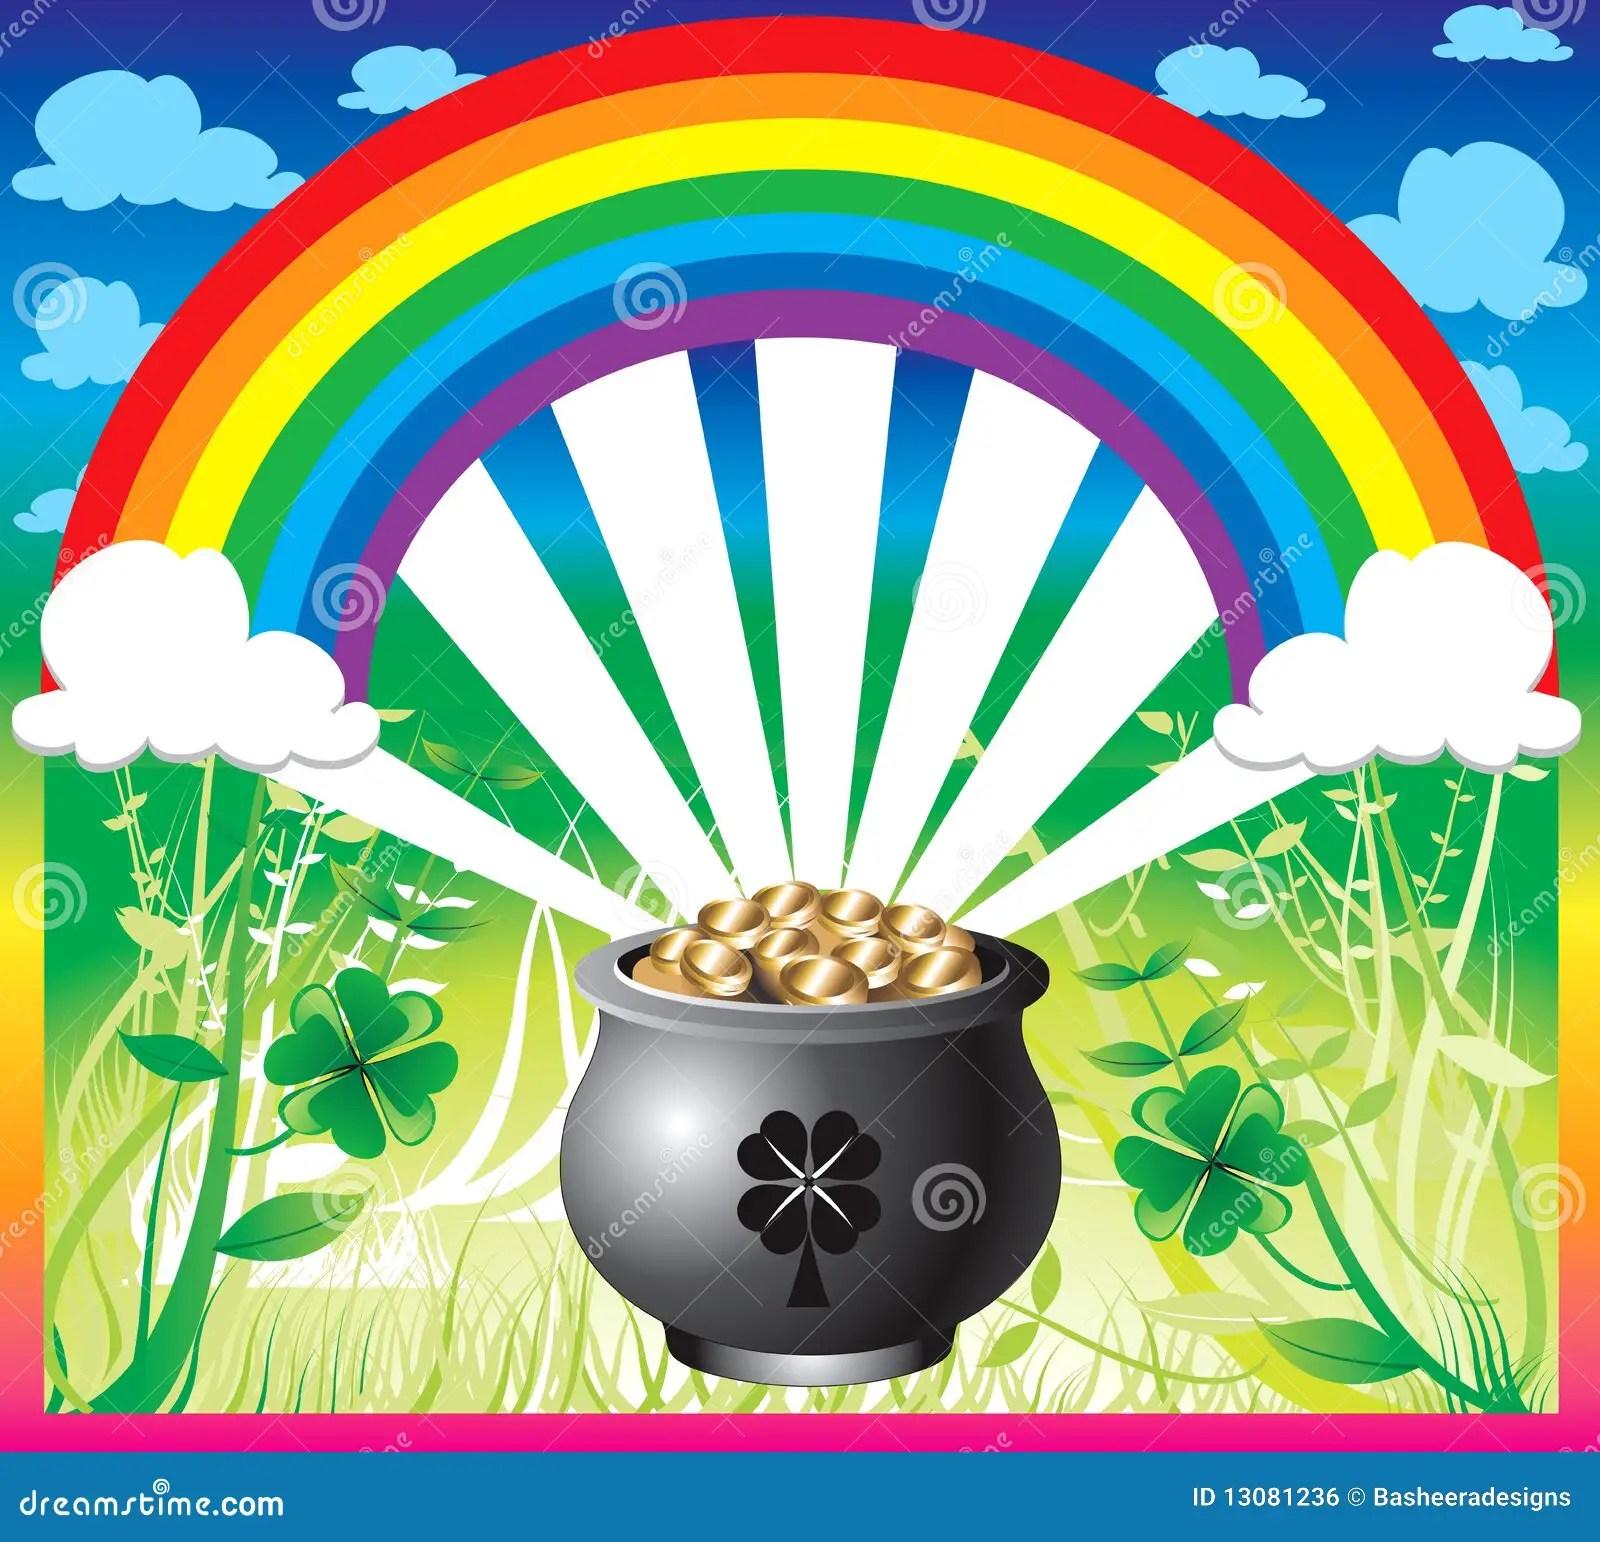 St Patrick S Day Rainbow Royalty Free Stock Image